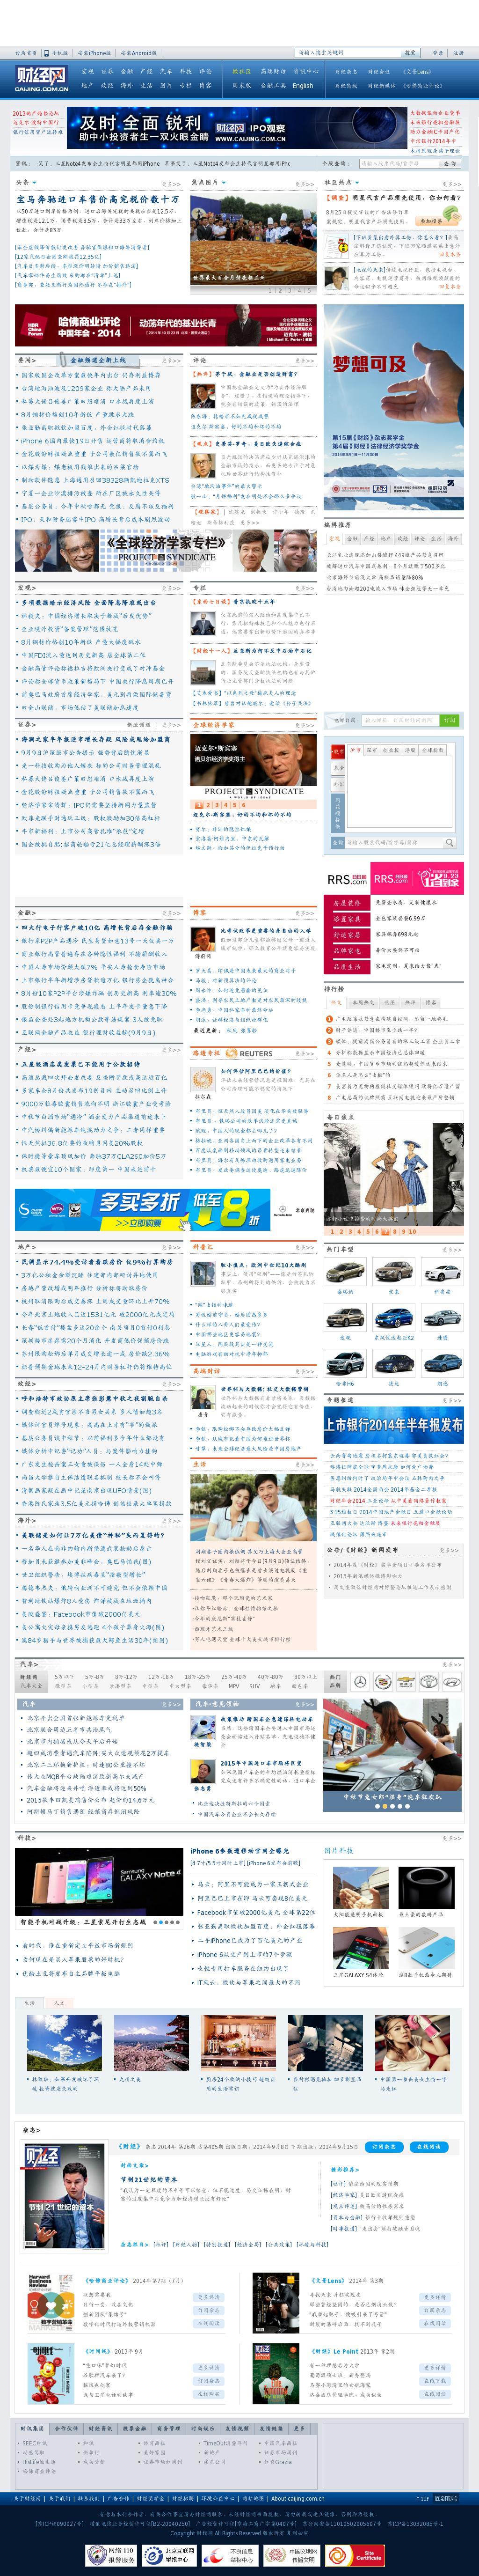 Caijing at Tuesday Sept. 9, 2014, 7:01 a.m. UTC